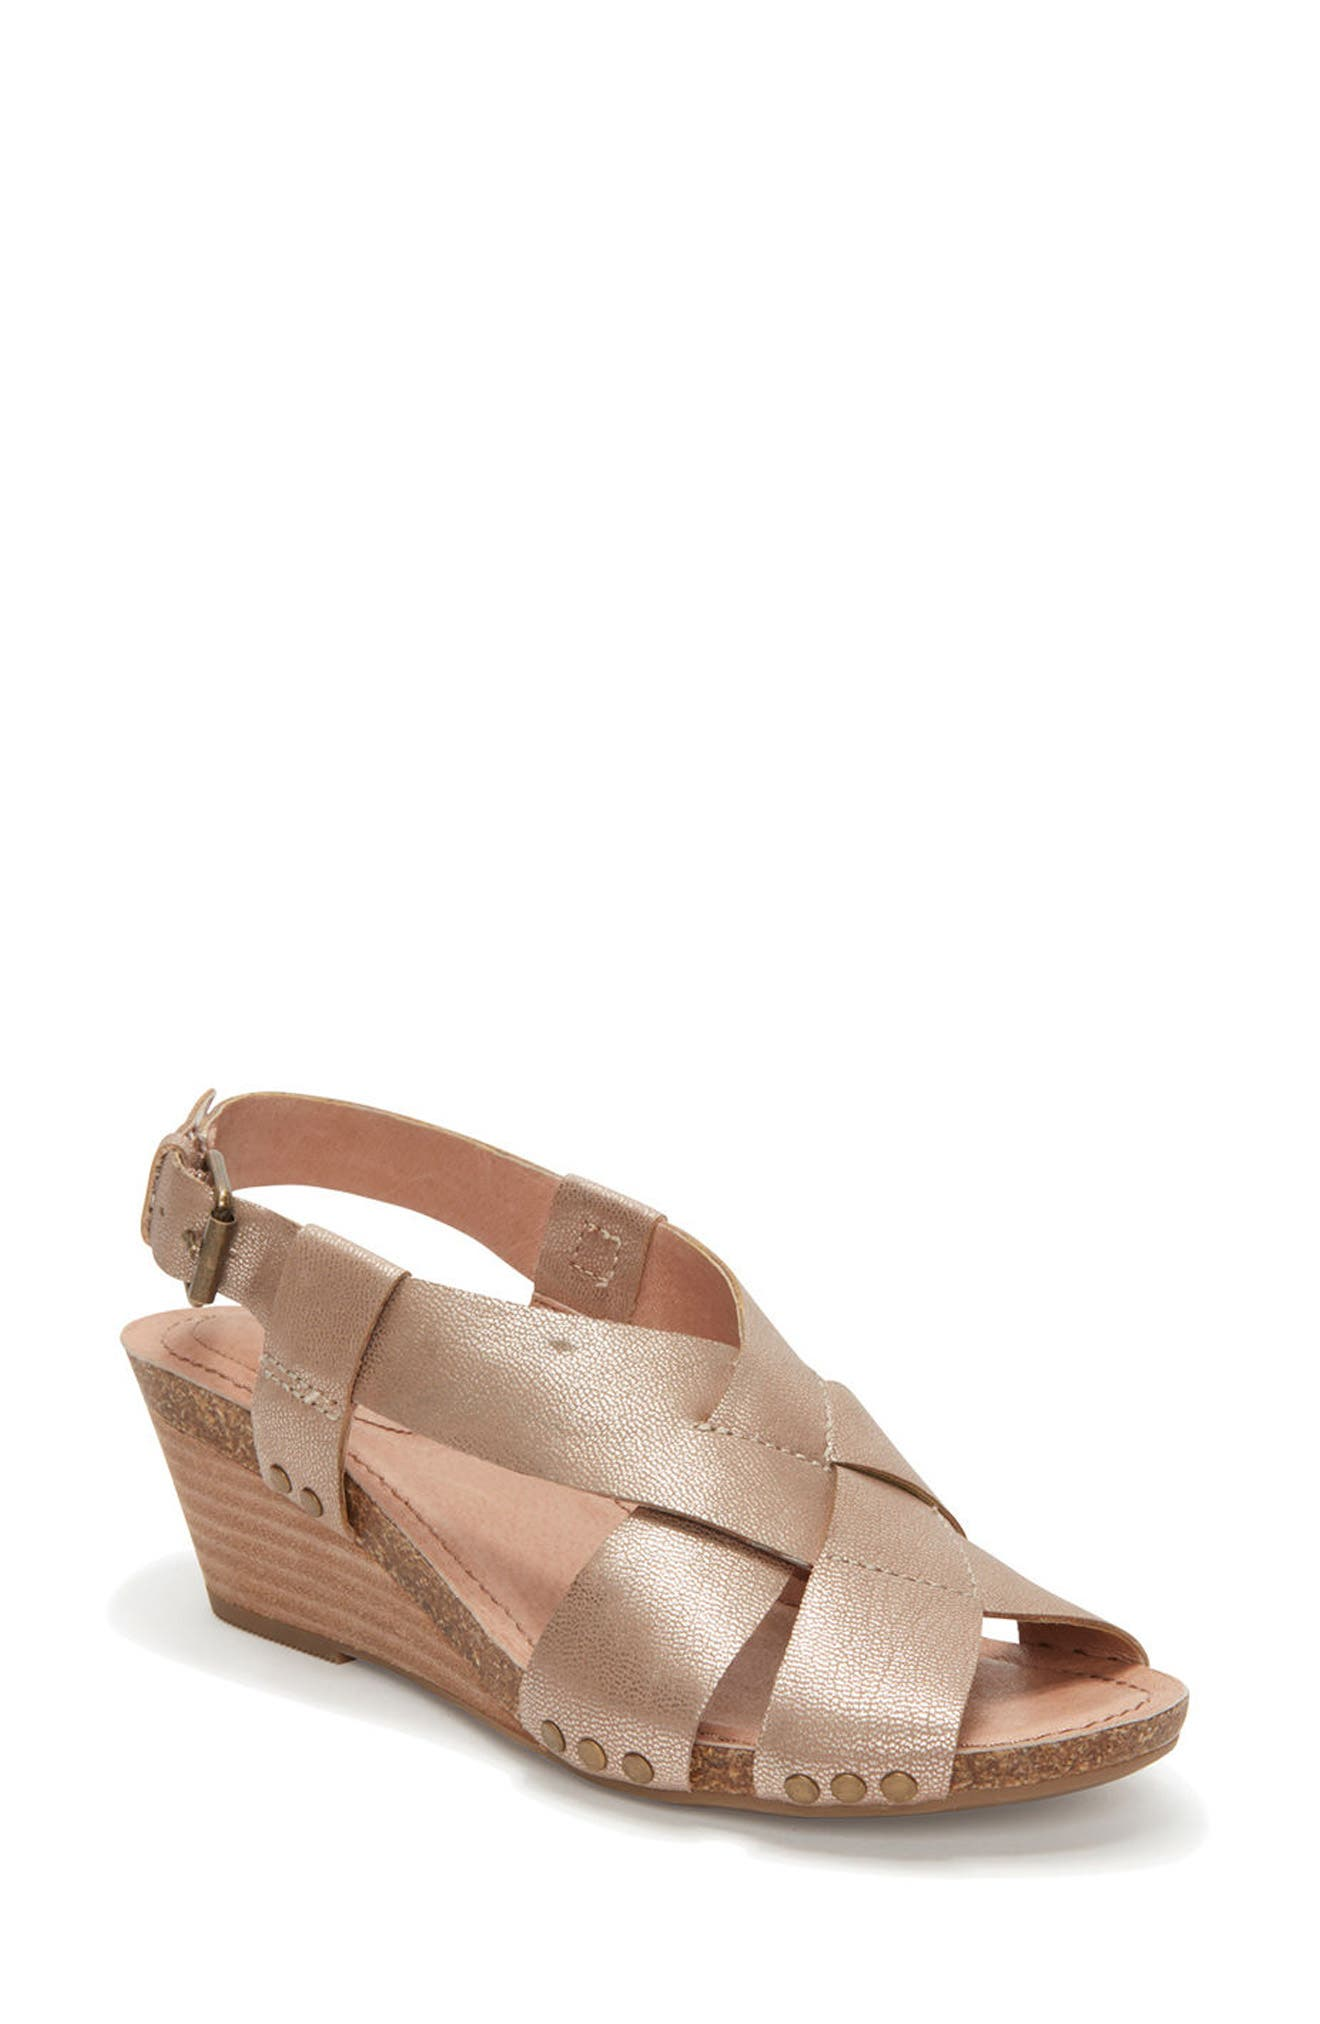 Adam Tucker Tarin Wedge Sandal,                         Main,                         color, Champagne Leather